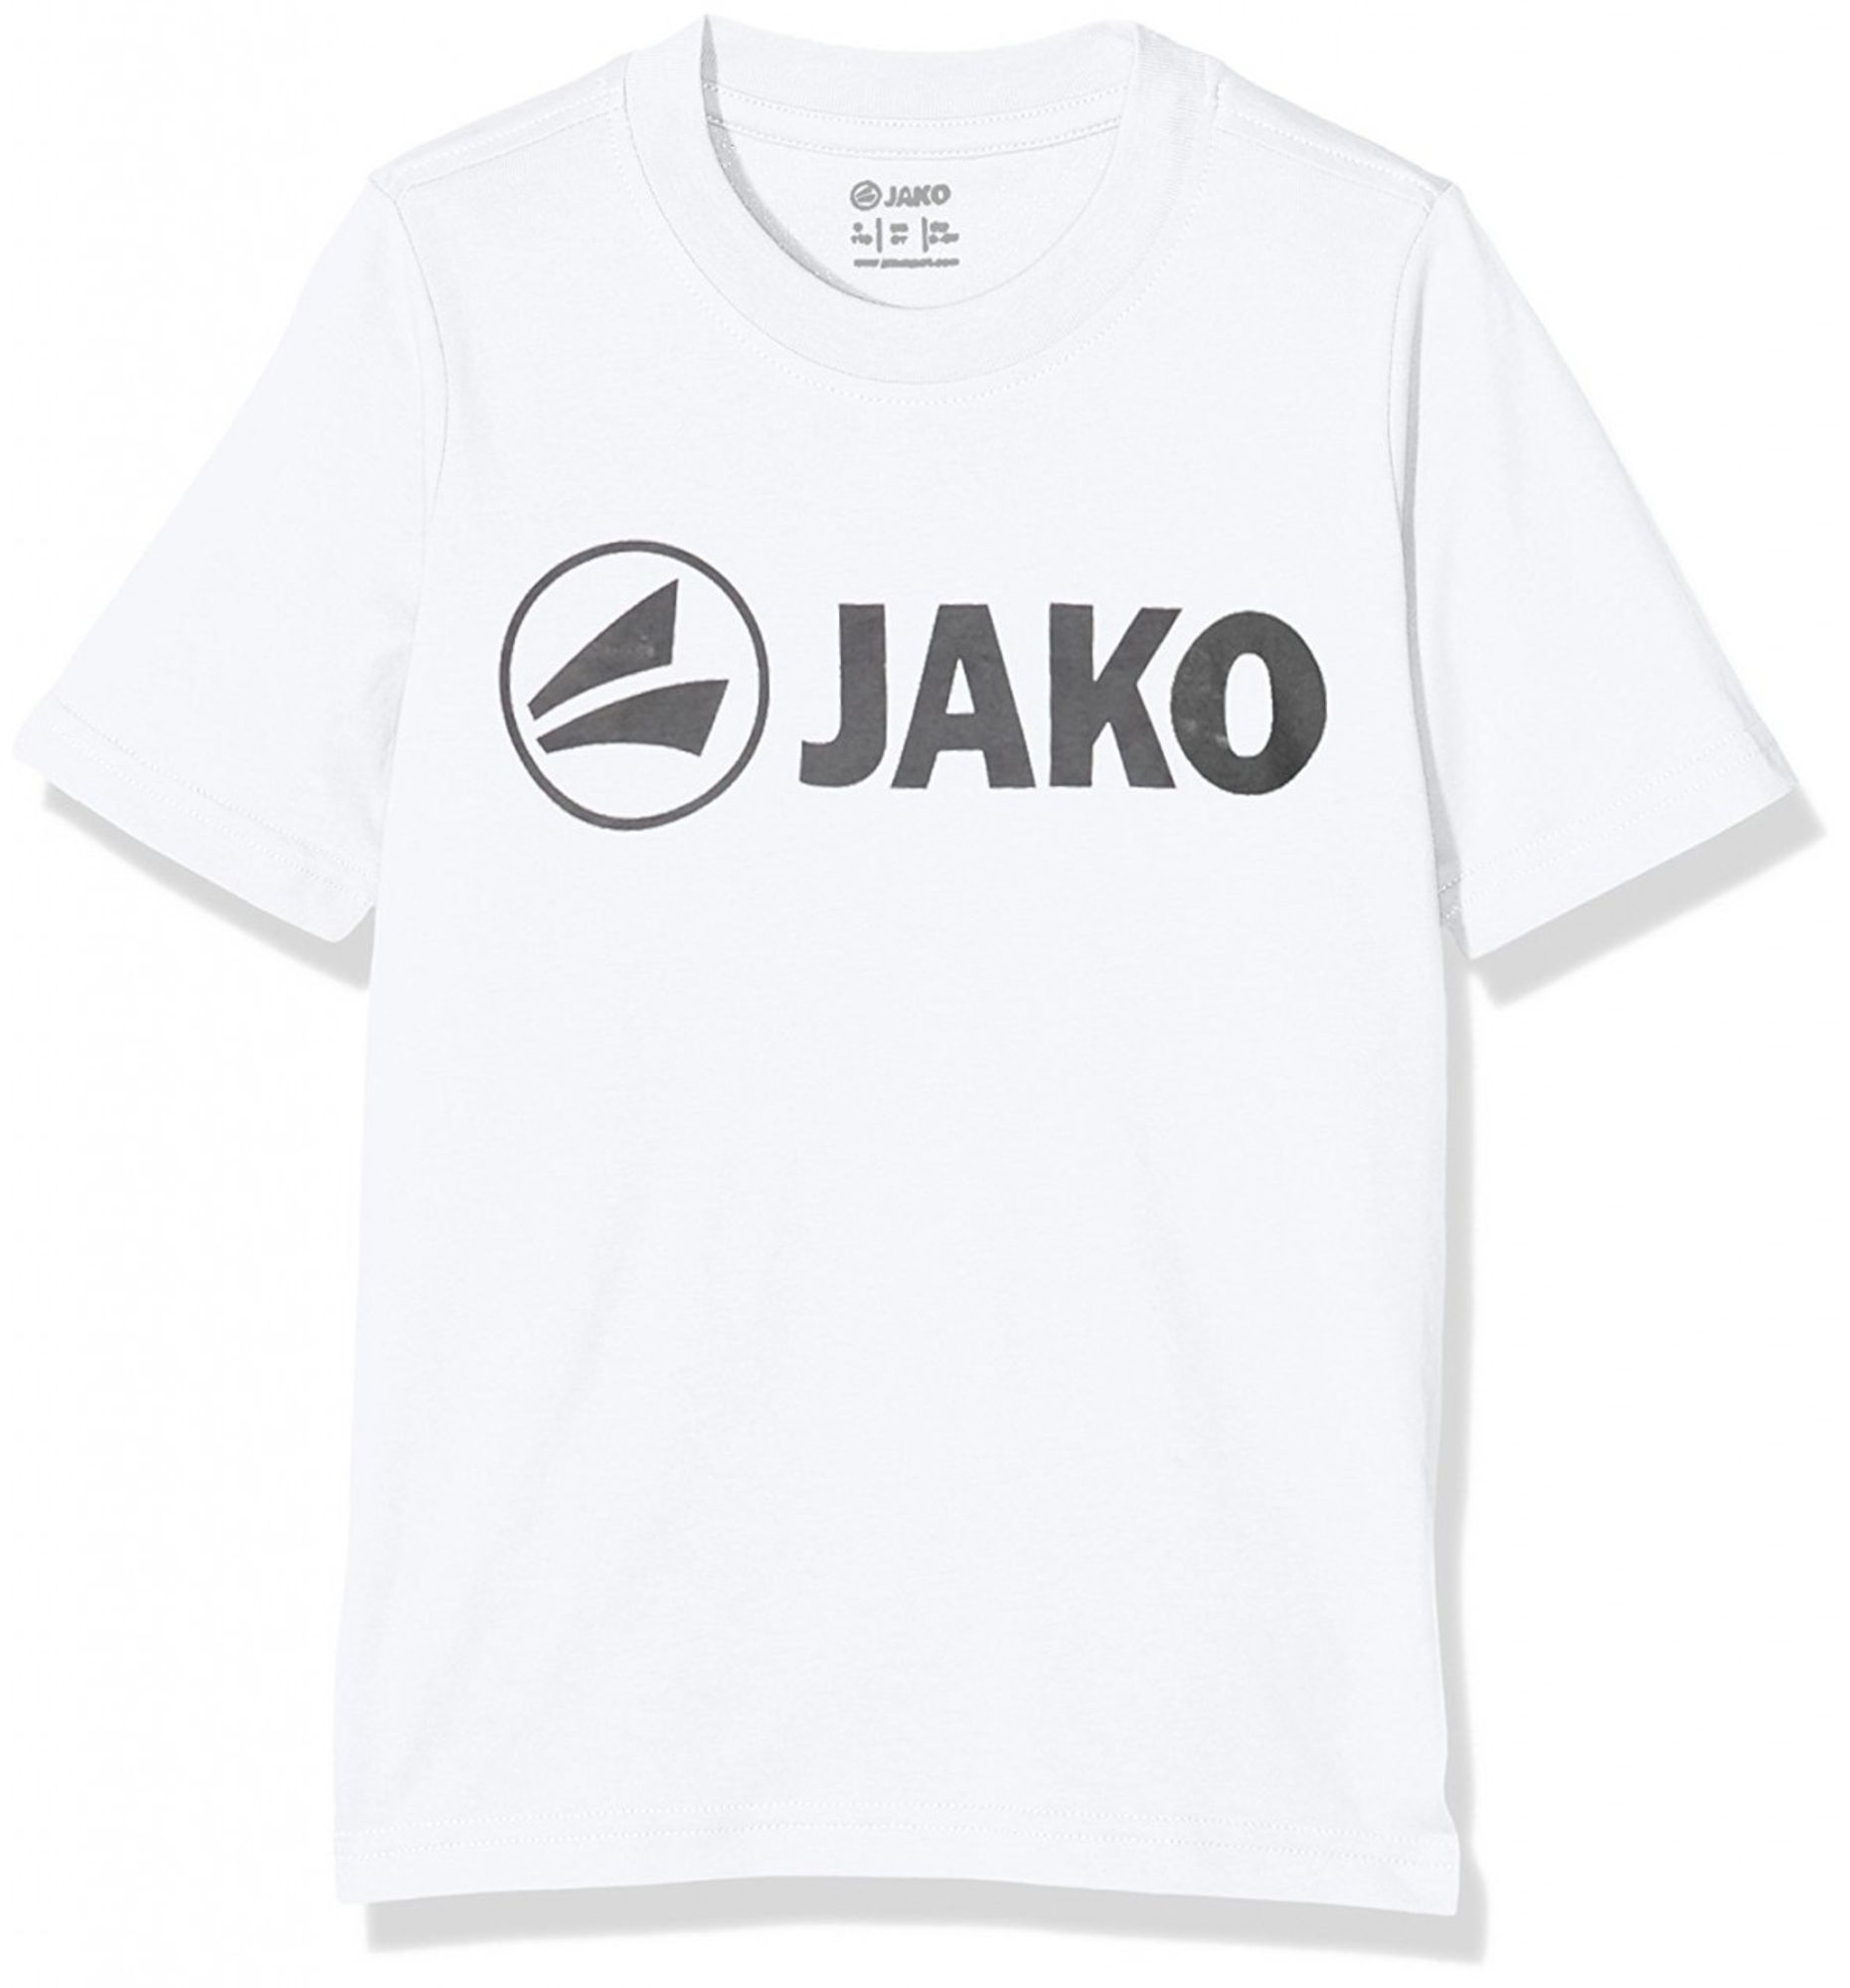 Jako T- Shirt Promo - weiß